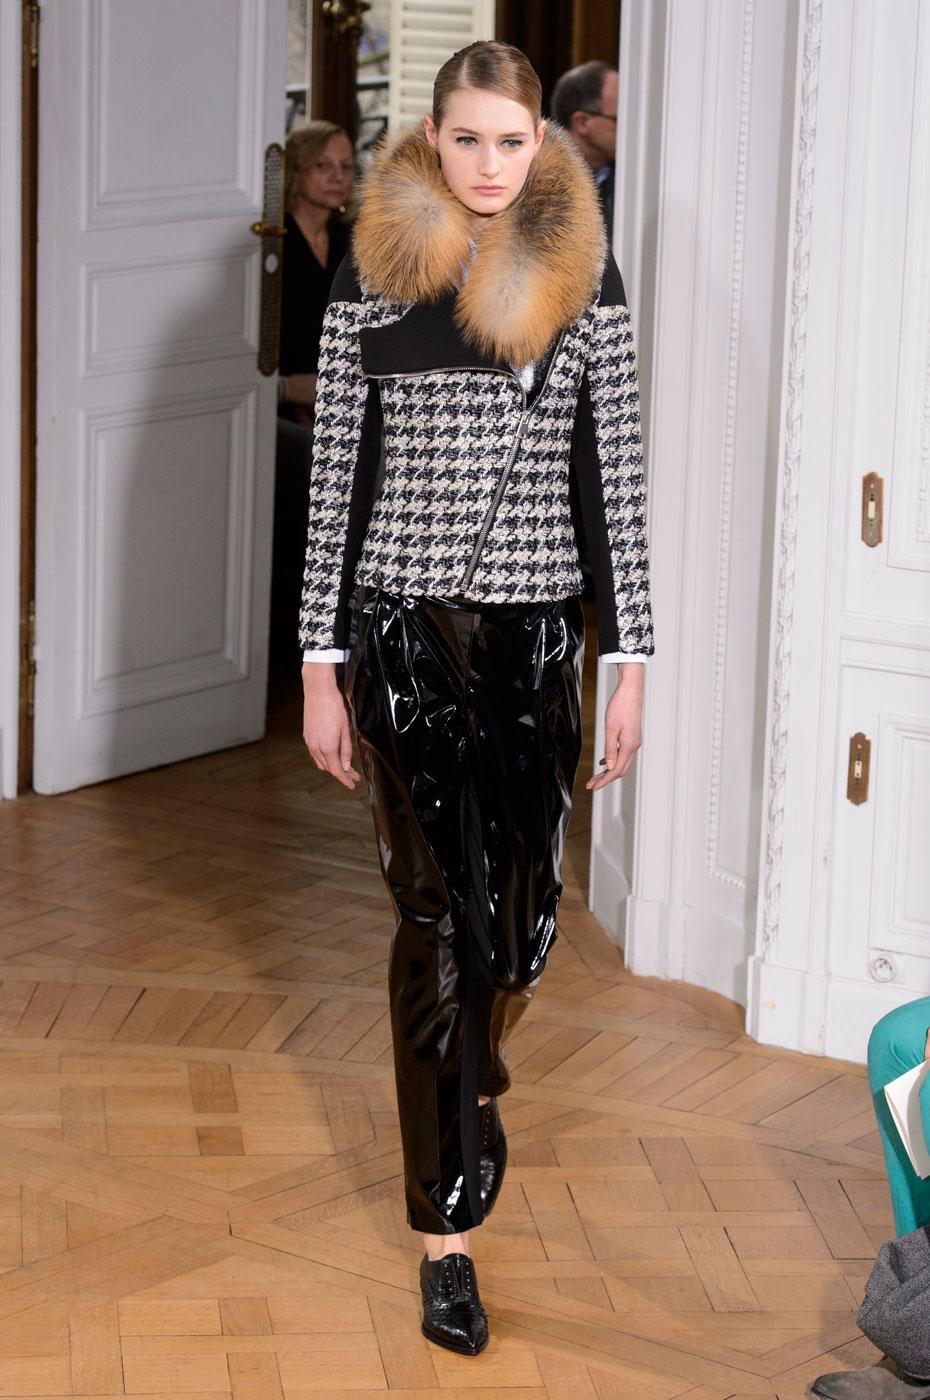 Bouchra-Jarrar-fashion-runway-show-haute-couture-paris-spring-summer-2015-the-impression-33